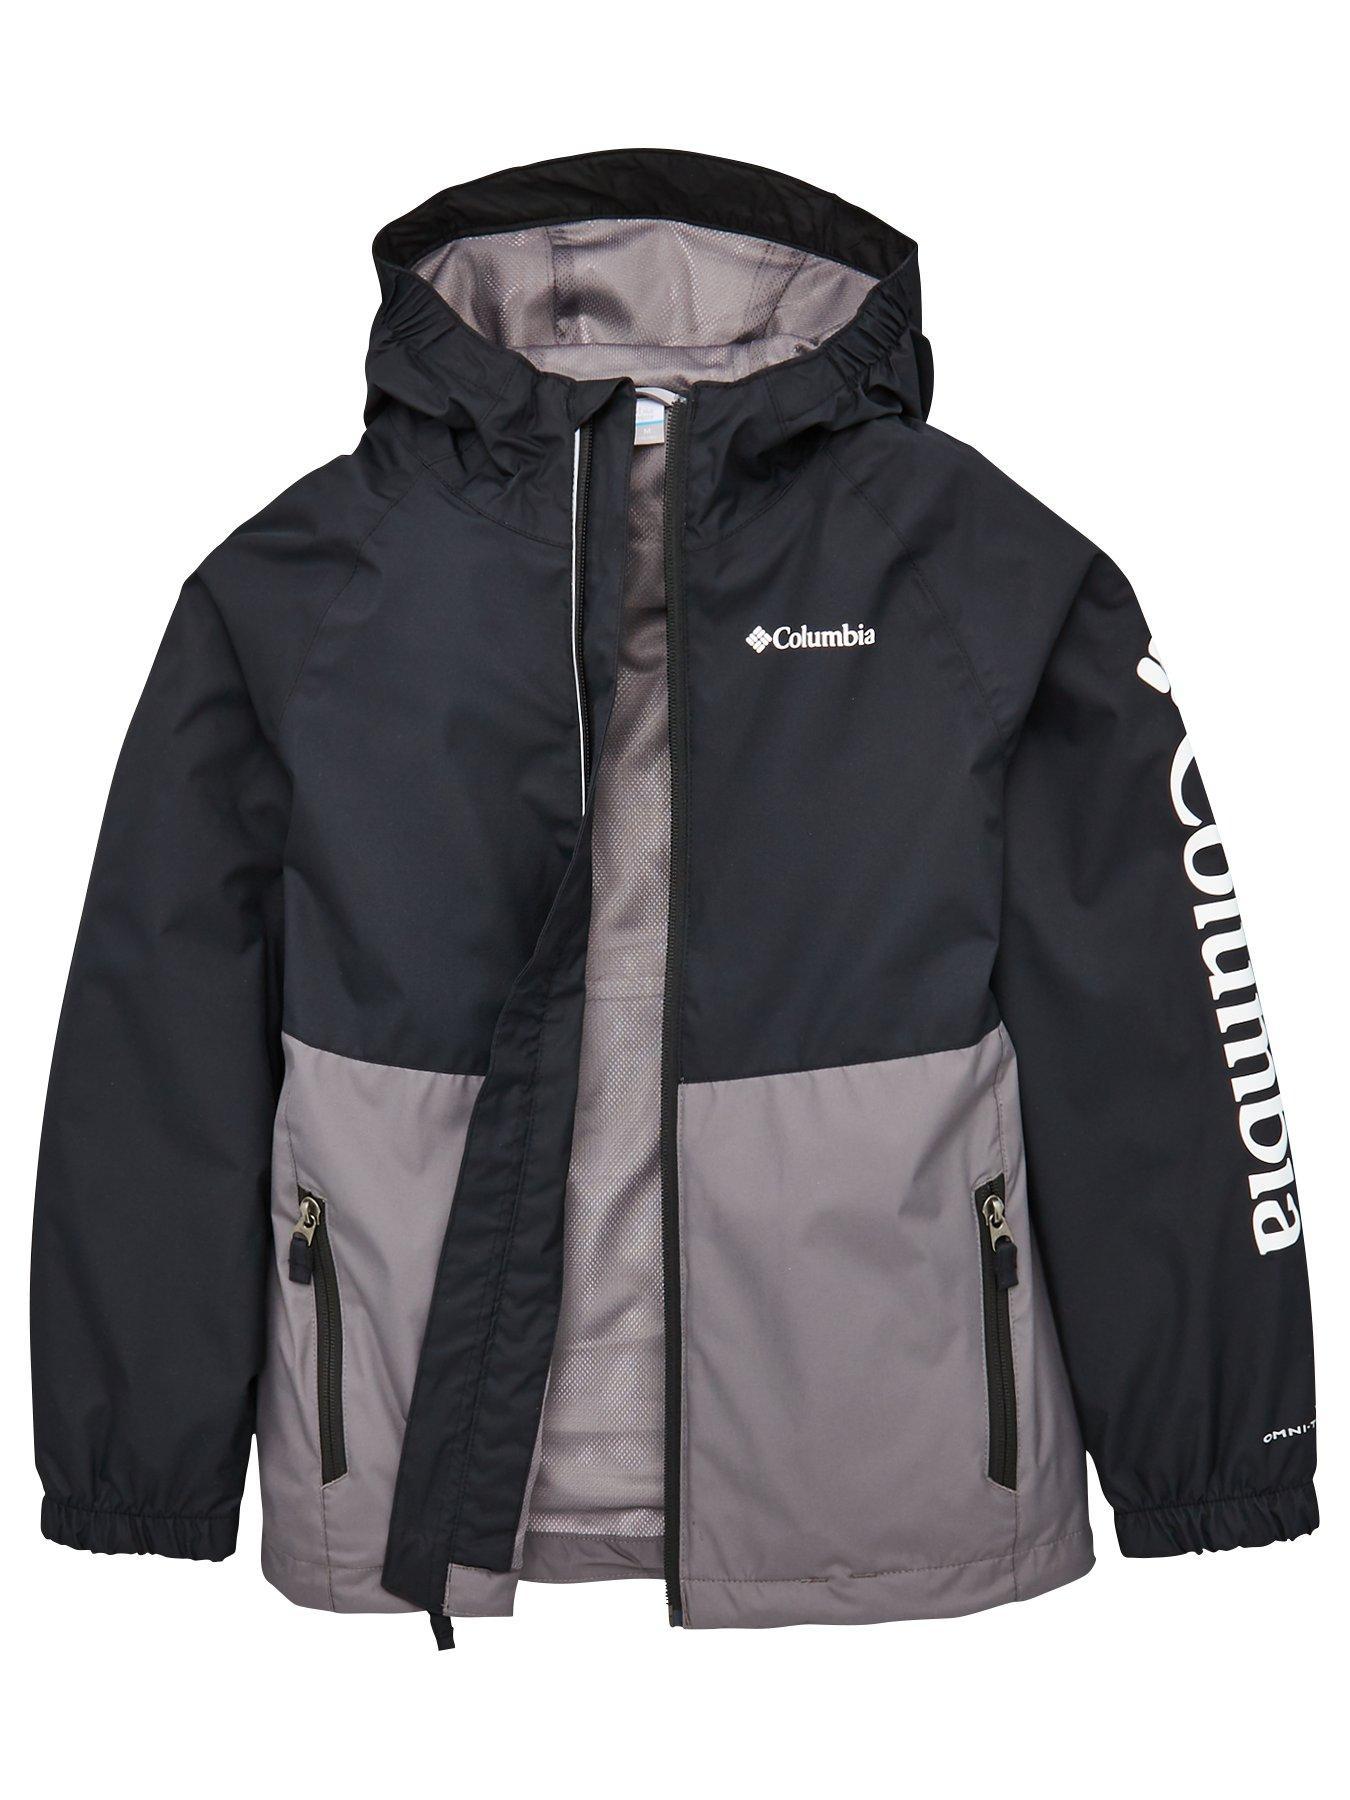 TRA 376 Regatta Classic Padded and Waterproof Children/'s Unisex School Jacket